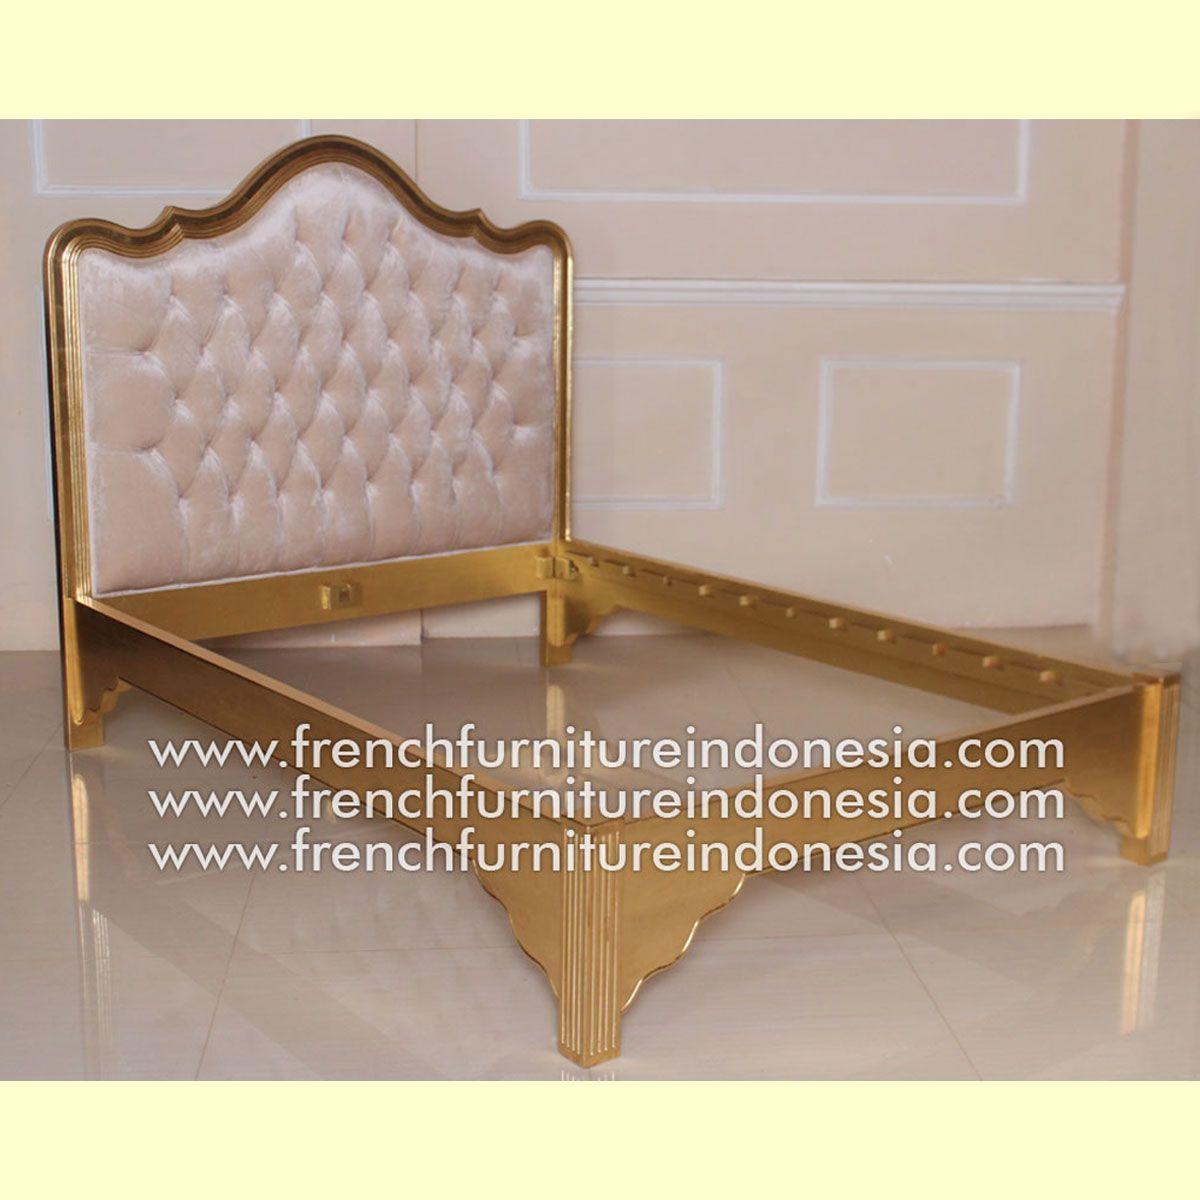 Minimal Bed Raisa House Indonesia Bed